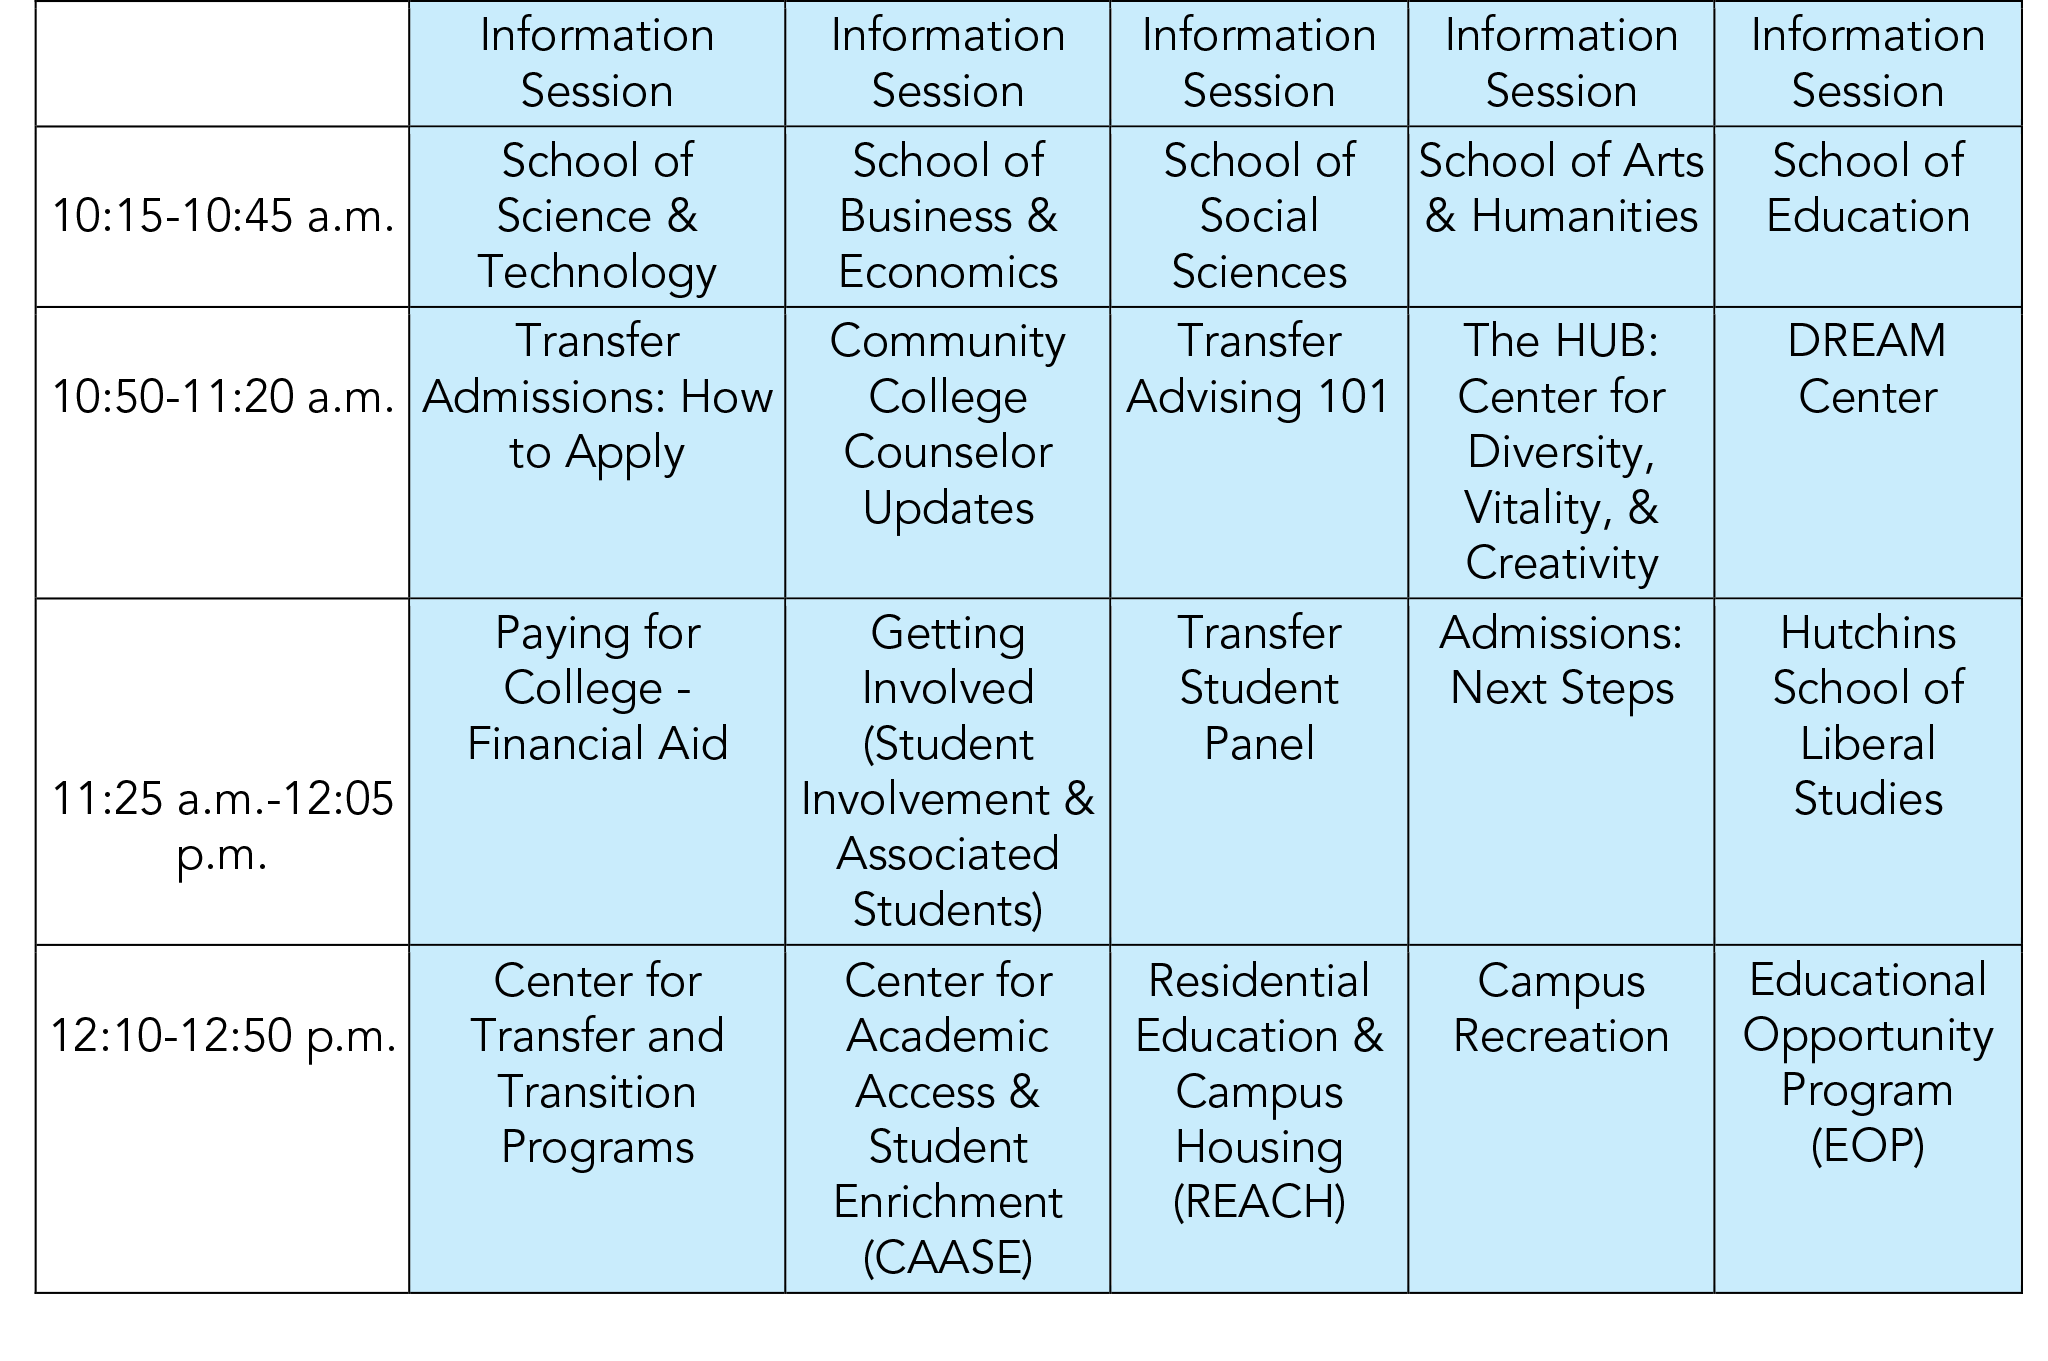 Workshop schedule for Virtual Transfer summit